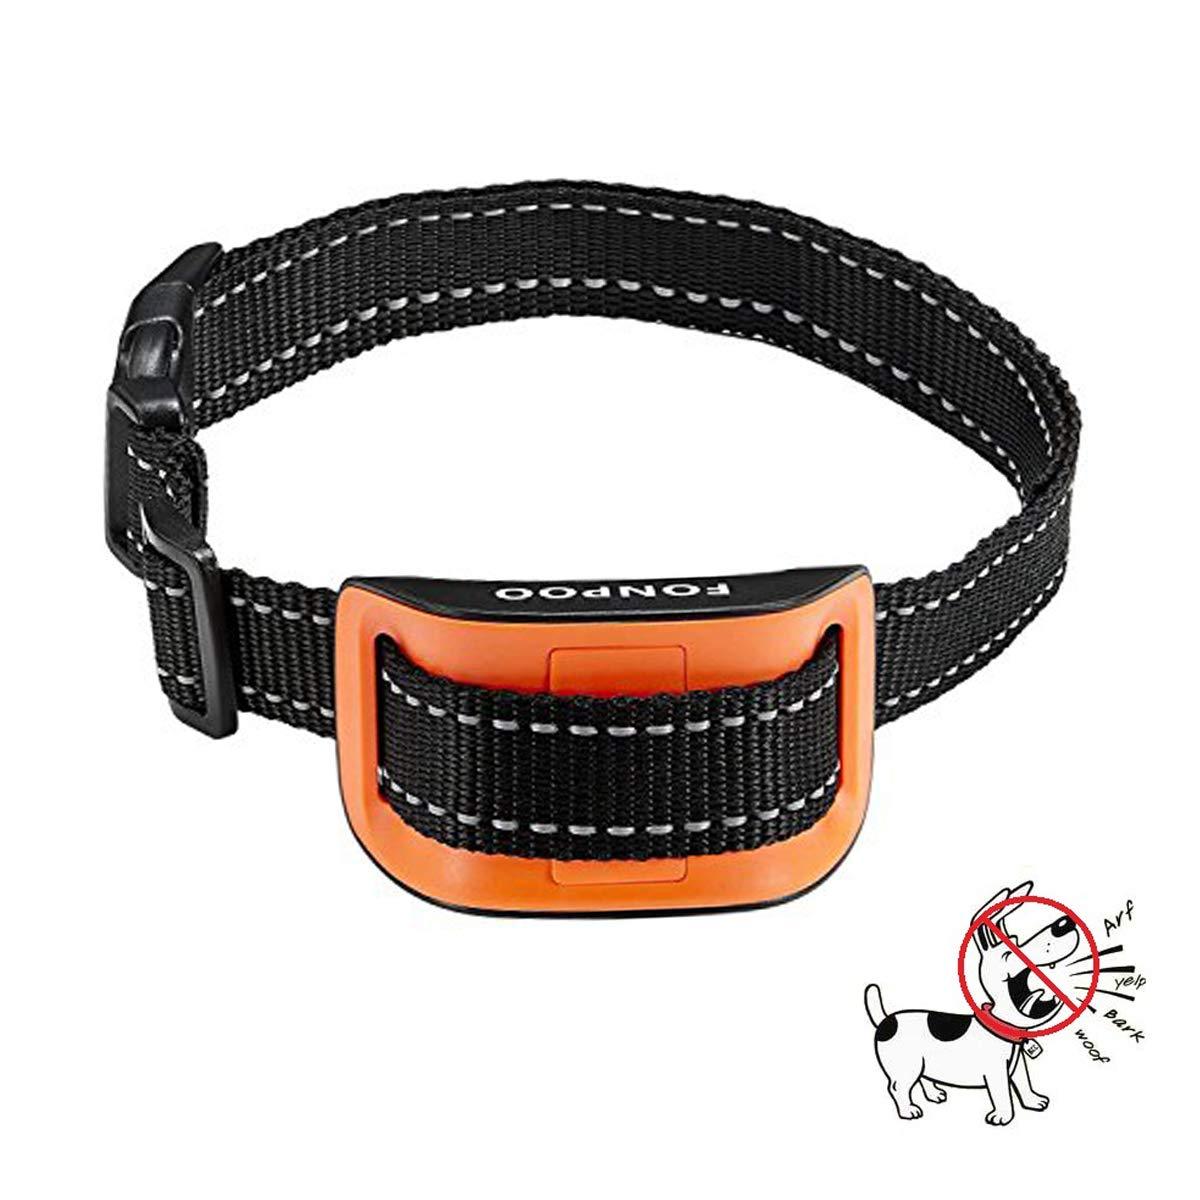 E orange FONPOO bark Collar   Shock Collar for Dogs Training Collars 7 Sensitivity Adjustable Level with Humane Shock Warning Sound for Small Medium Large Dog by (E orange)